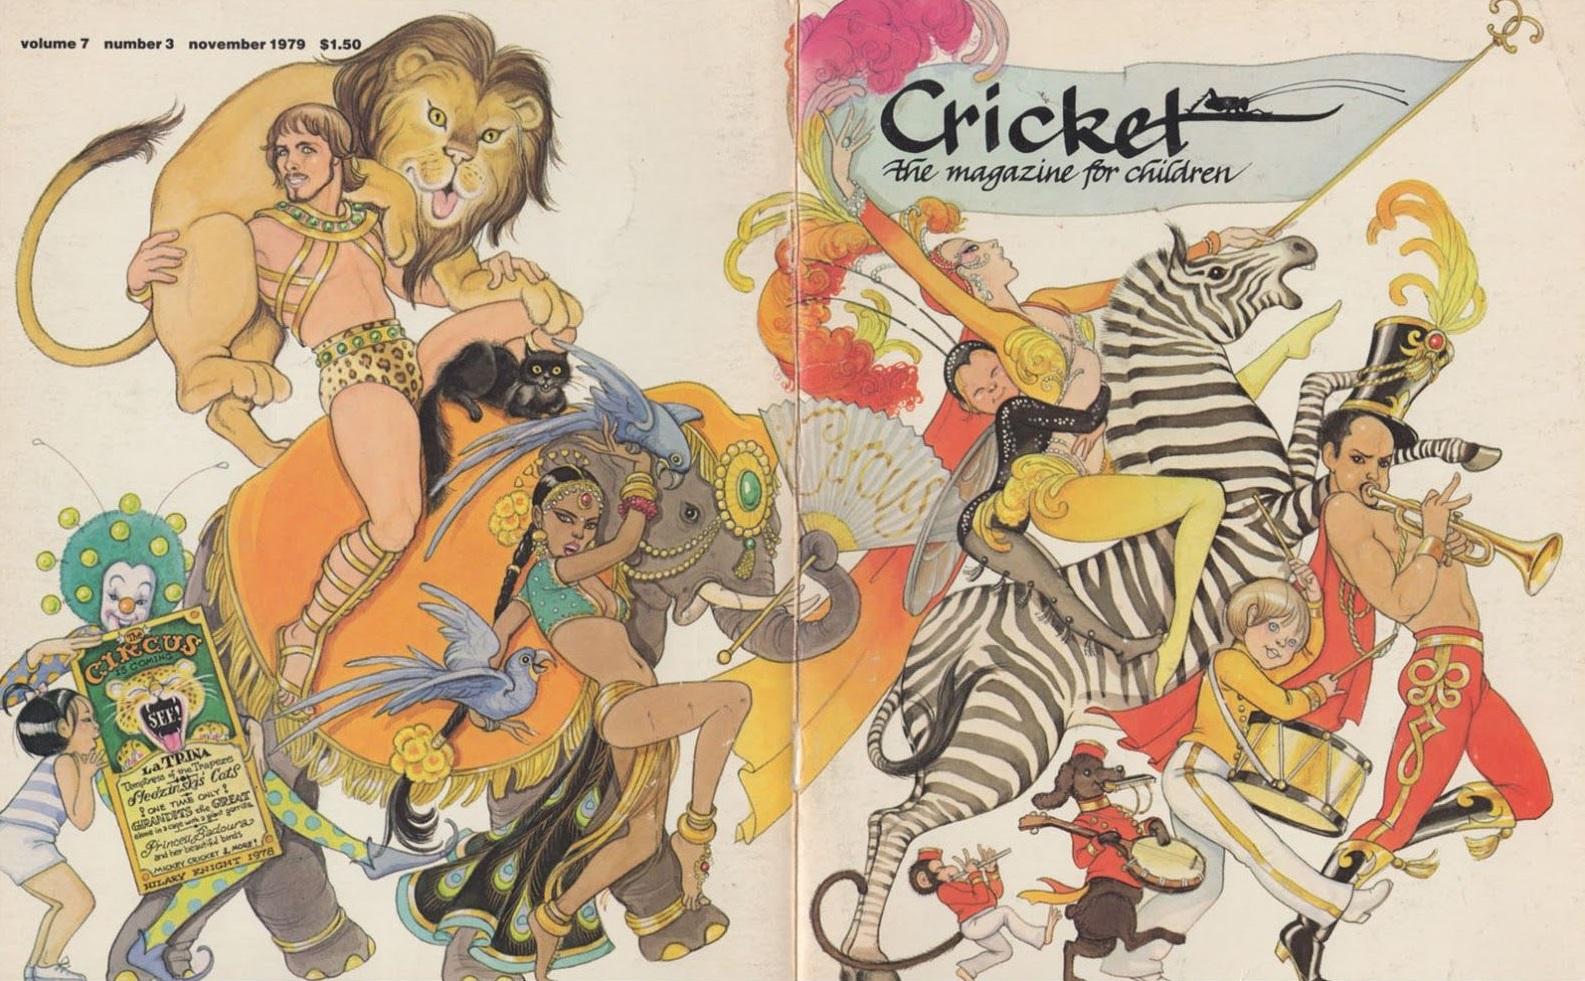 5 Beloved Illustrators Featured in Cricket Magazine